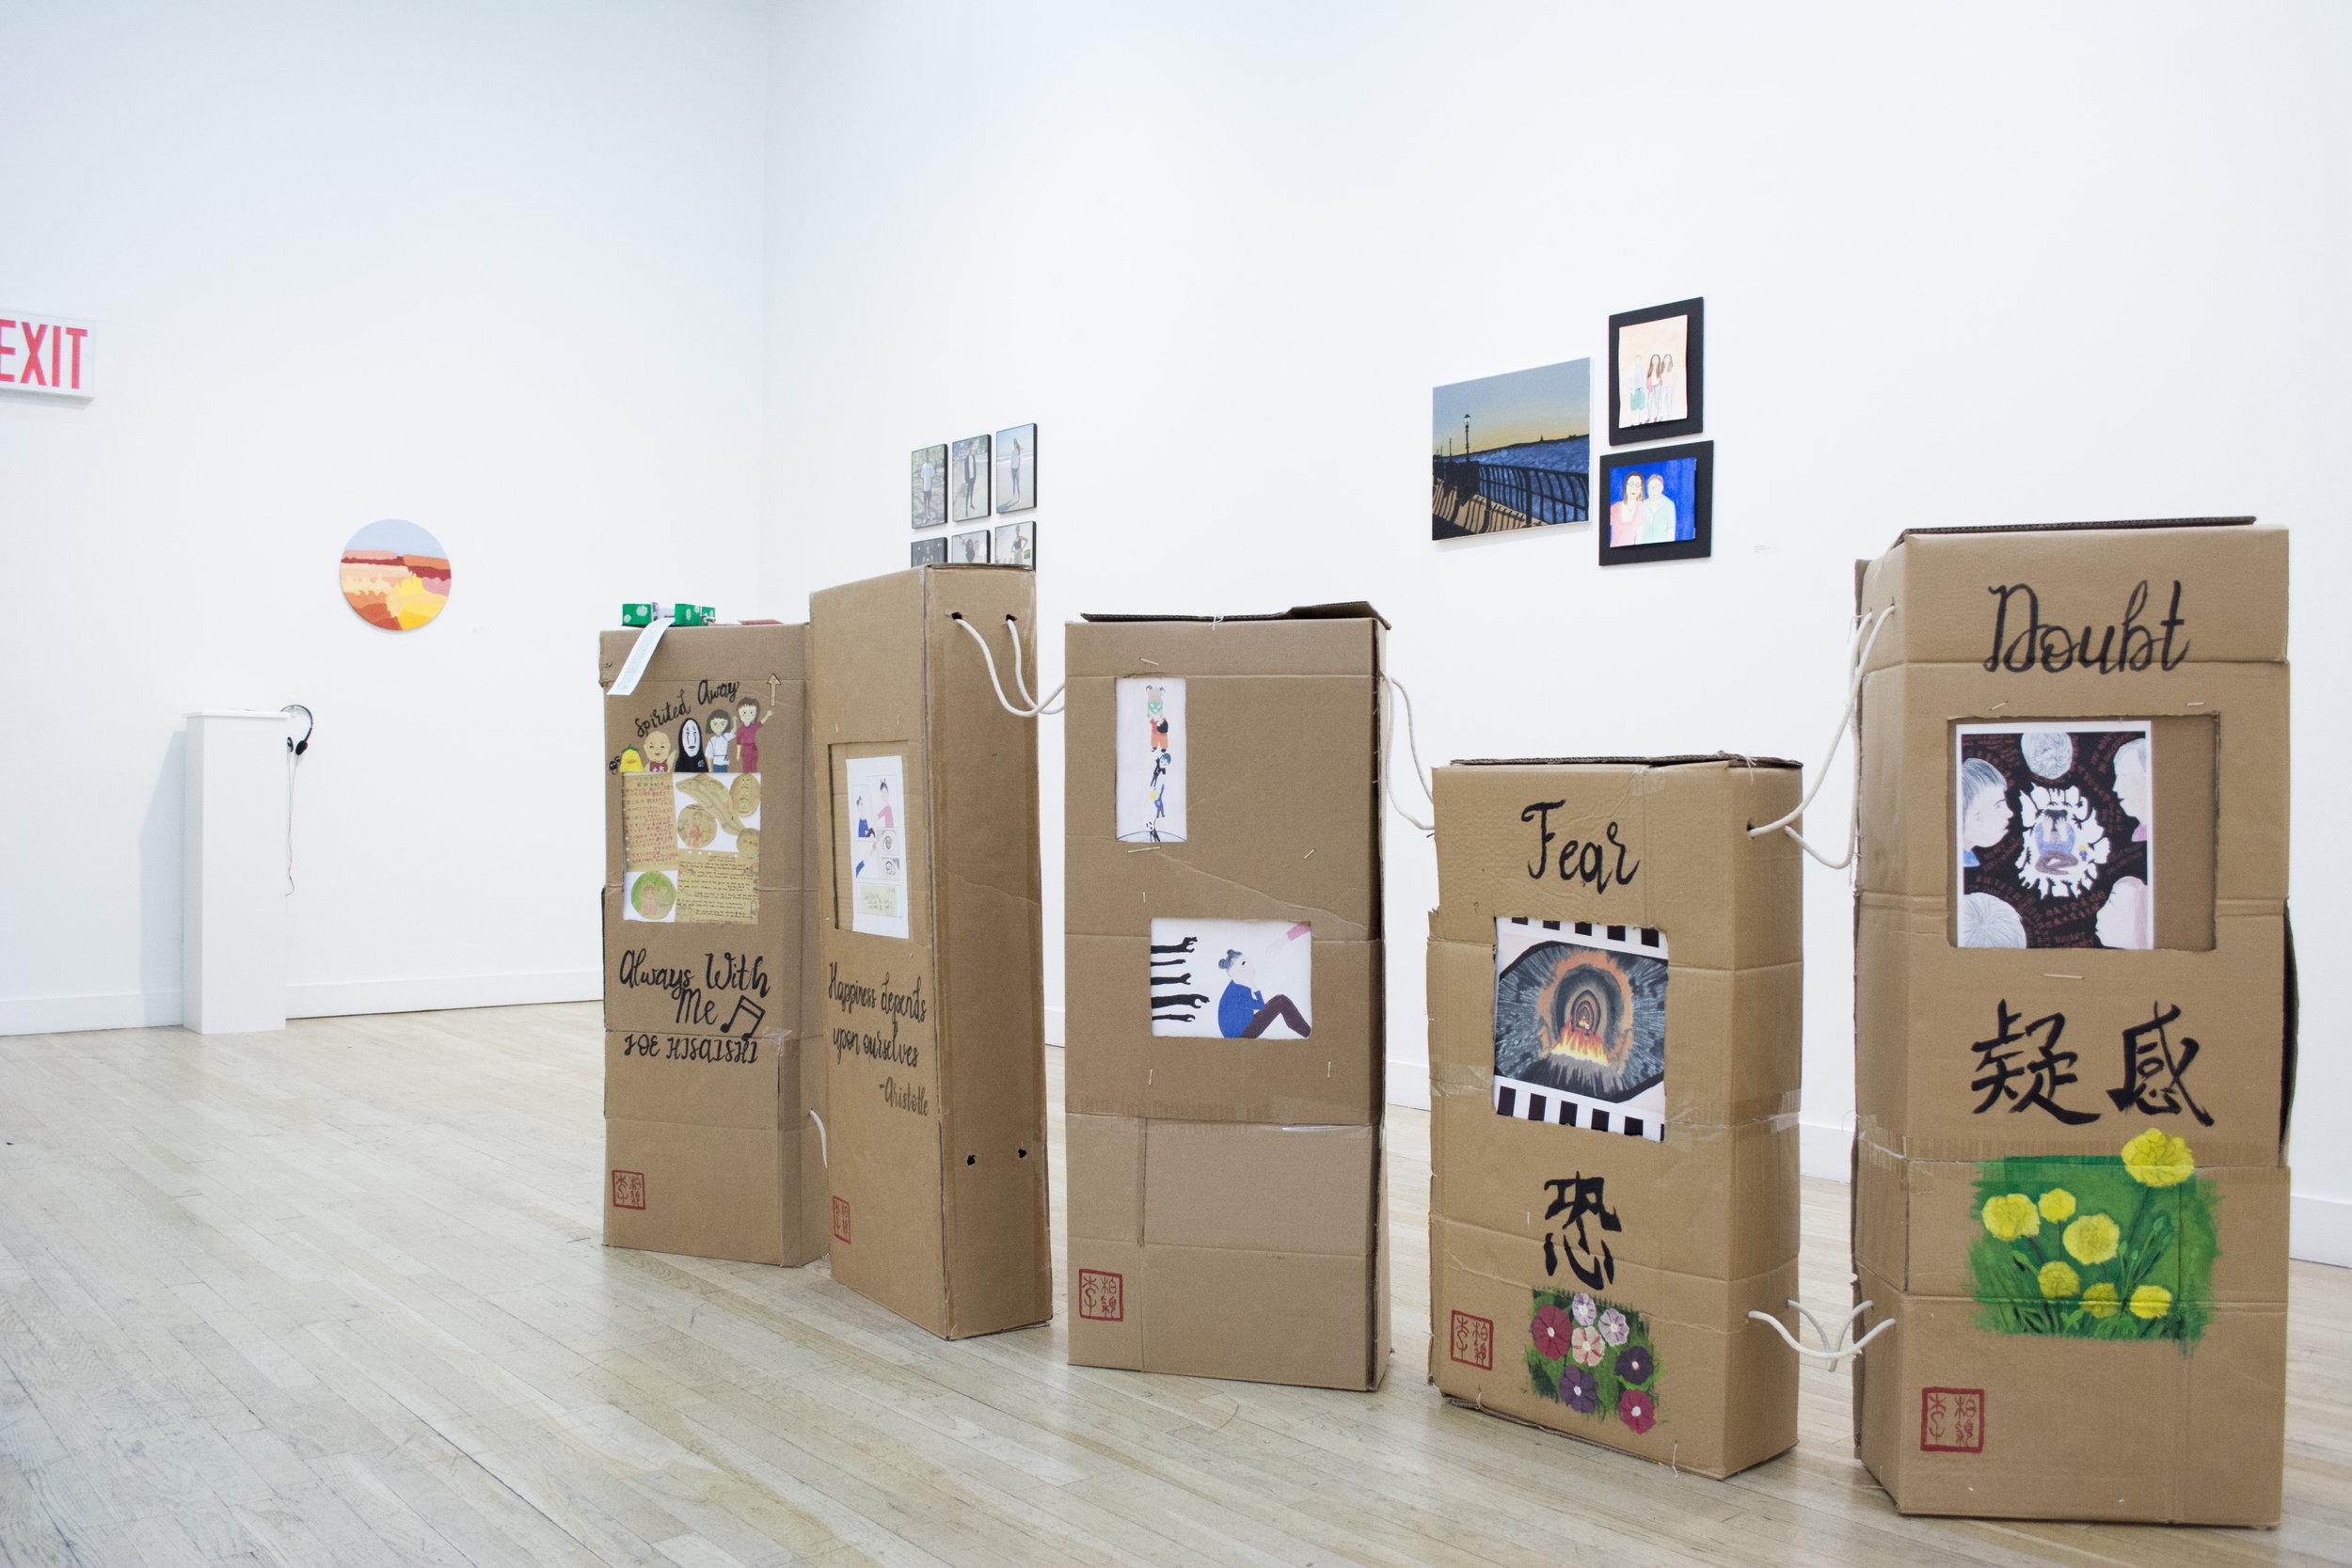 Petvy Li  Emotional Boxes , 2018 Acrylic on cardboard, drawing, mixed media